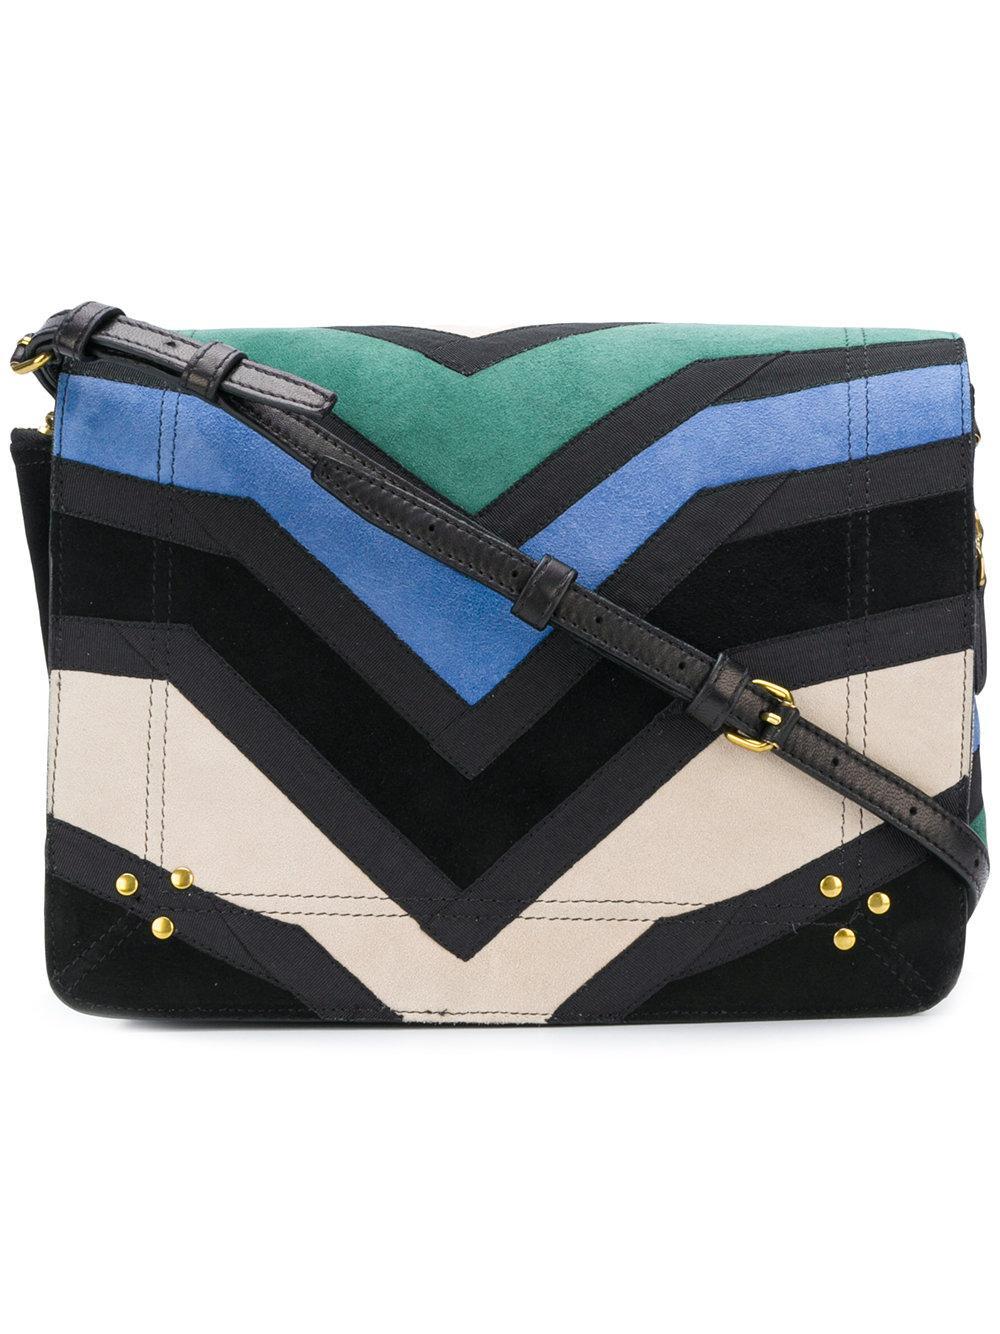 JÉrÔme Dreyfuss Zigzag Shoulder Bag